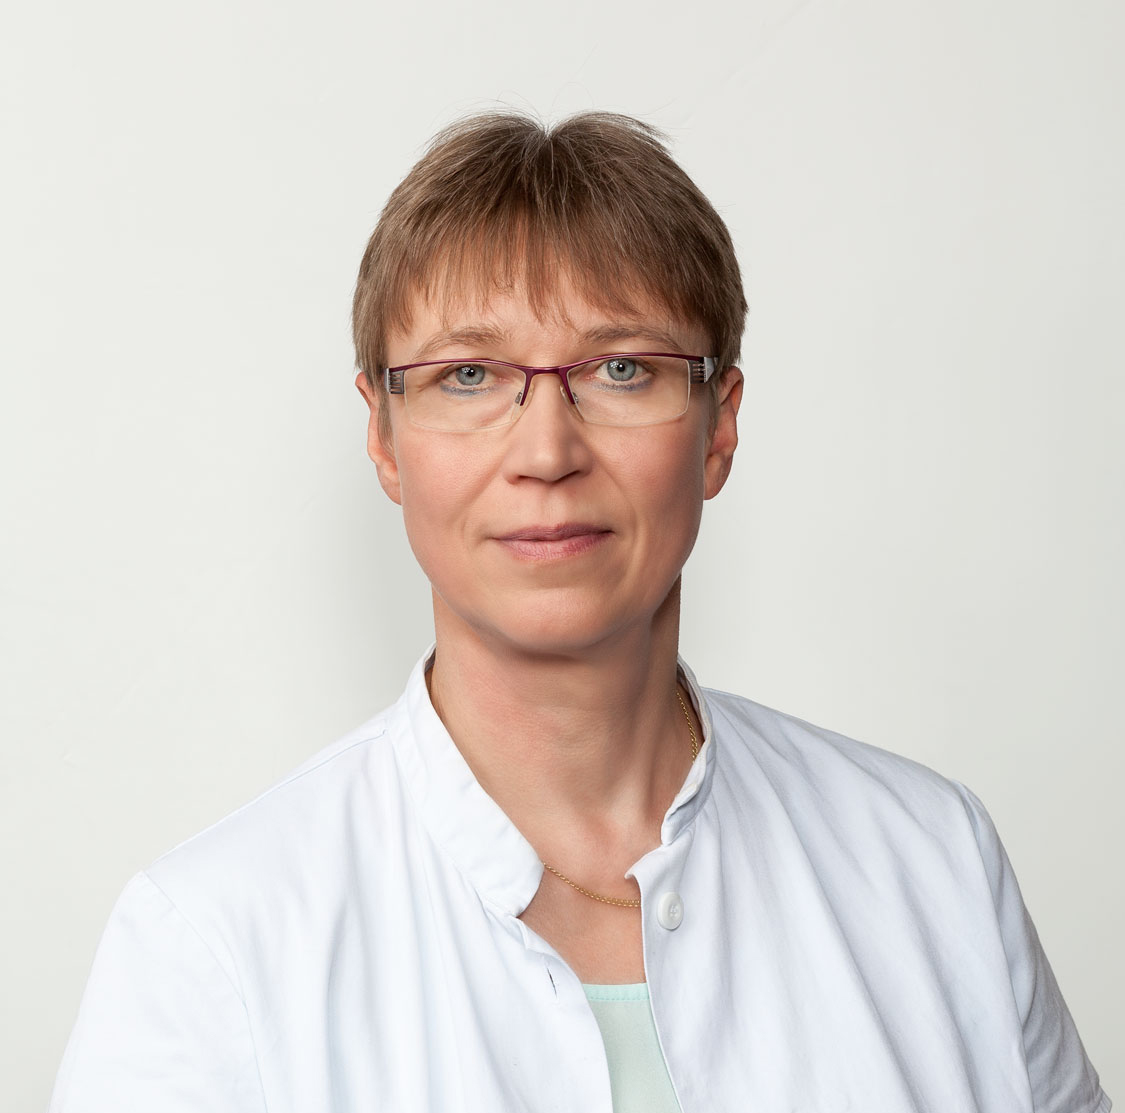 Porträtfoto von Beate Thomas